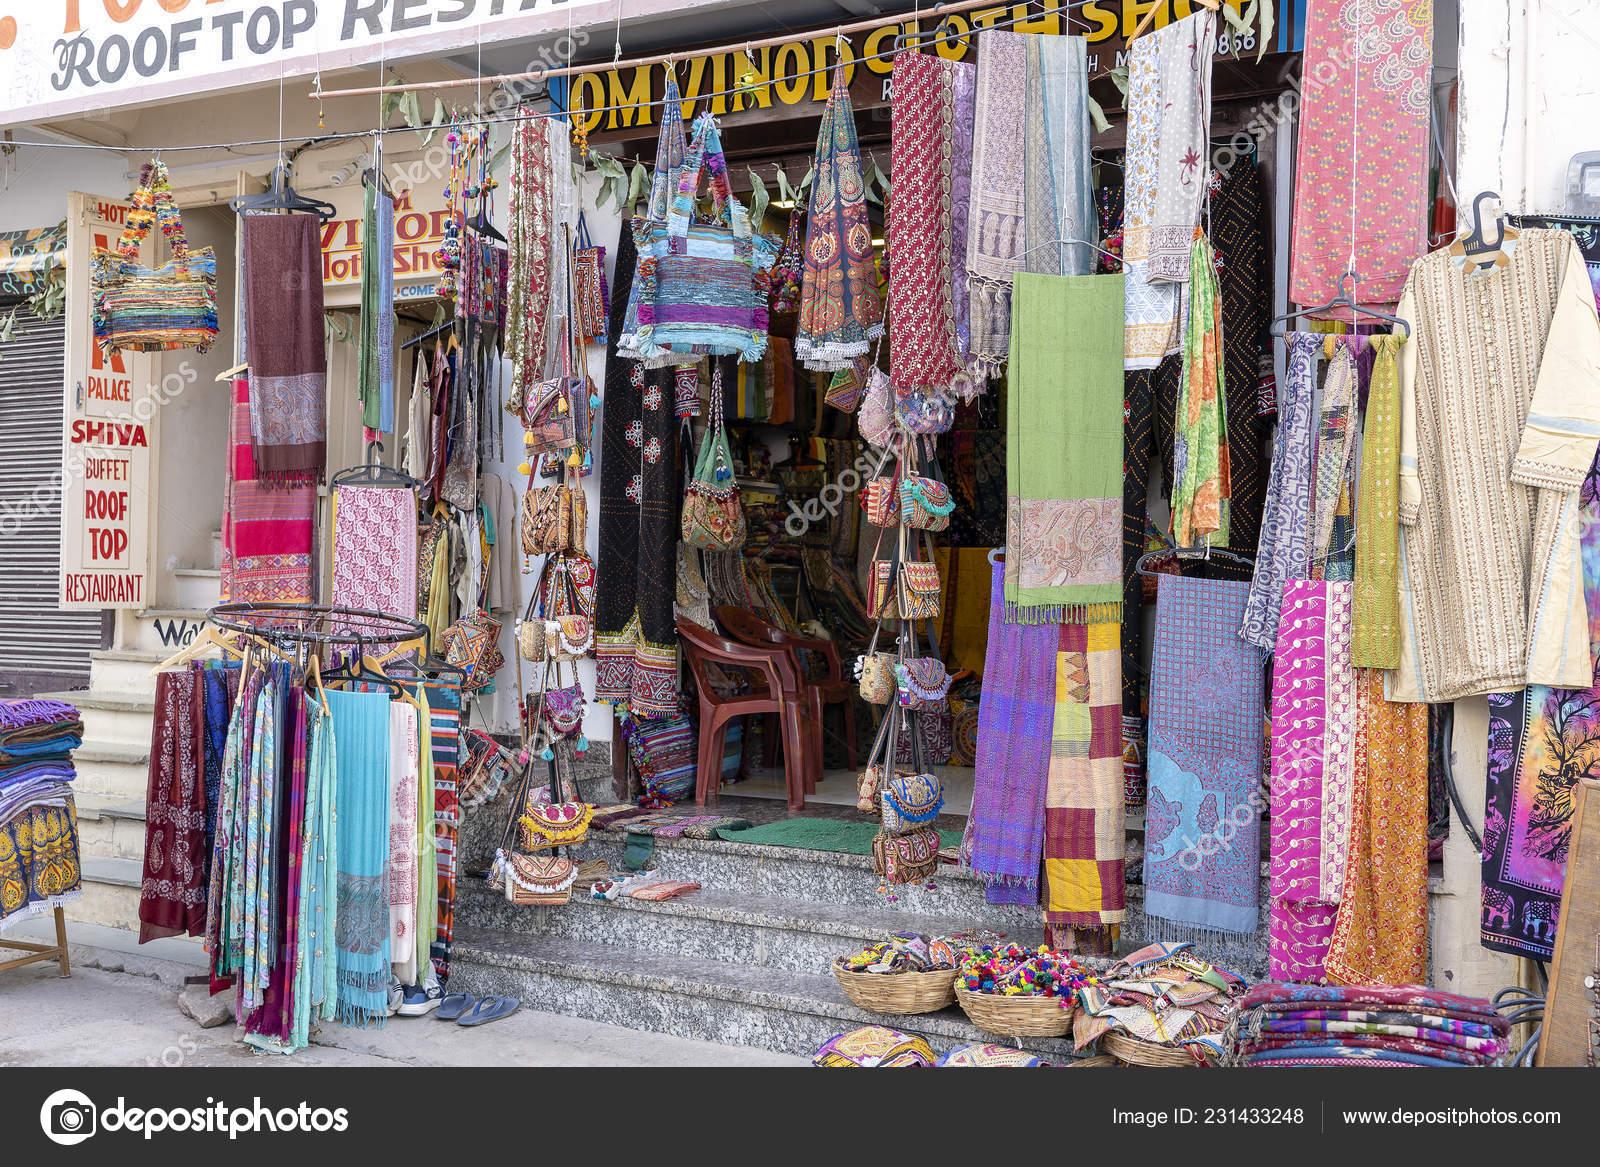 54cd29b2ec27 Pushkar Ινδία Νοεμβρίου 2018 Ρούχα Και Δώρα Λαϊκή Αγορά Στην– Εκδοτικές  Φωτογραφίες Αρχείου